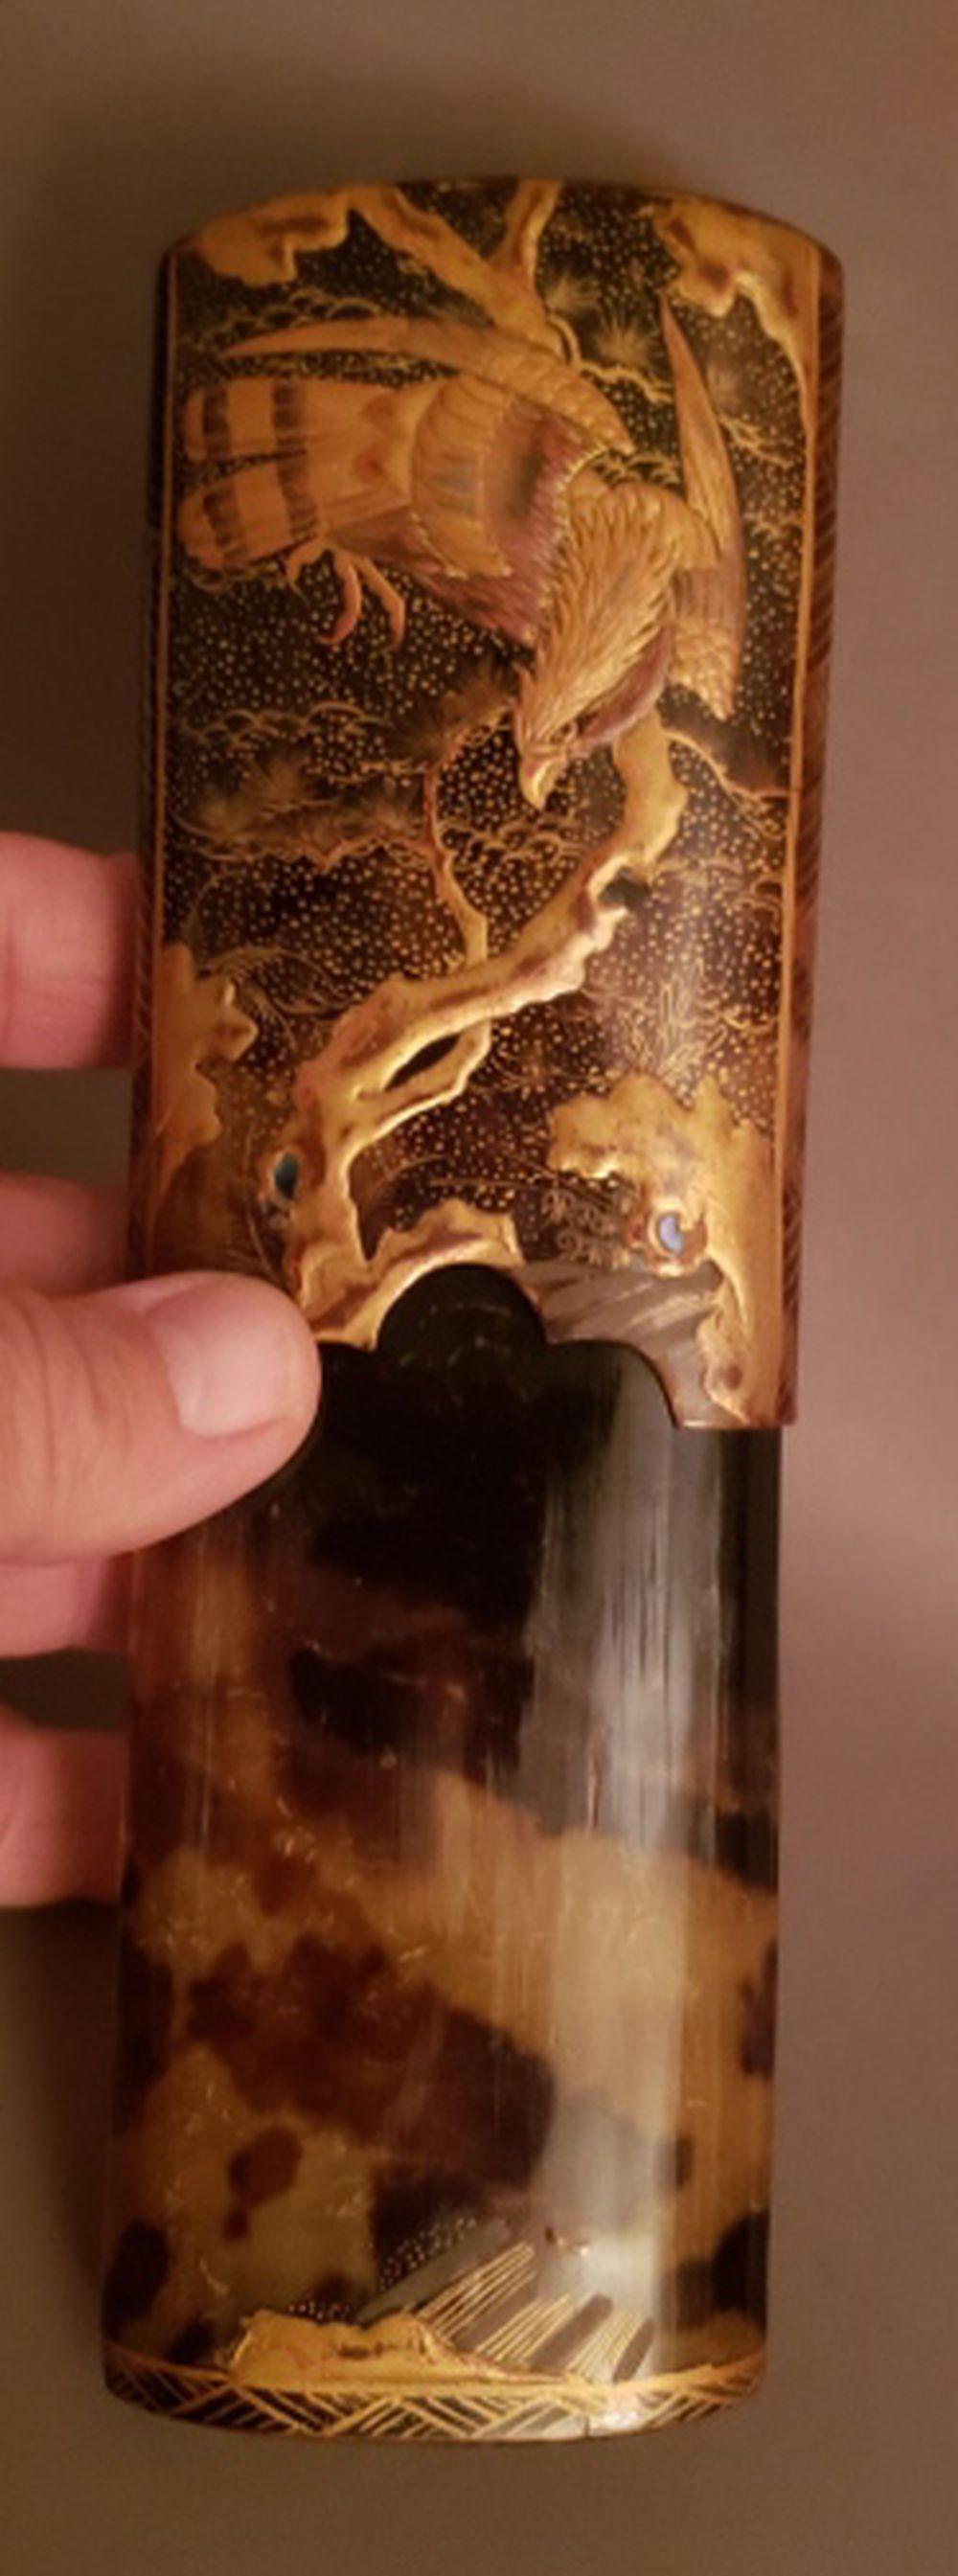 Antique Decorated Tortoiseshell Cigar Case